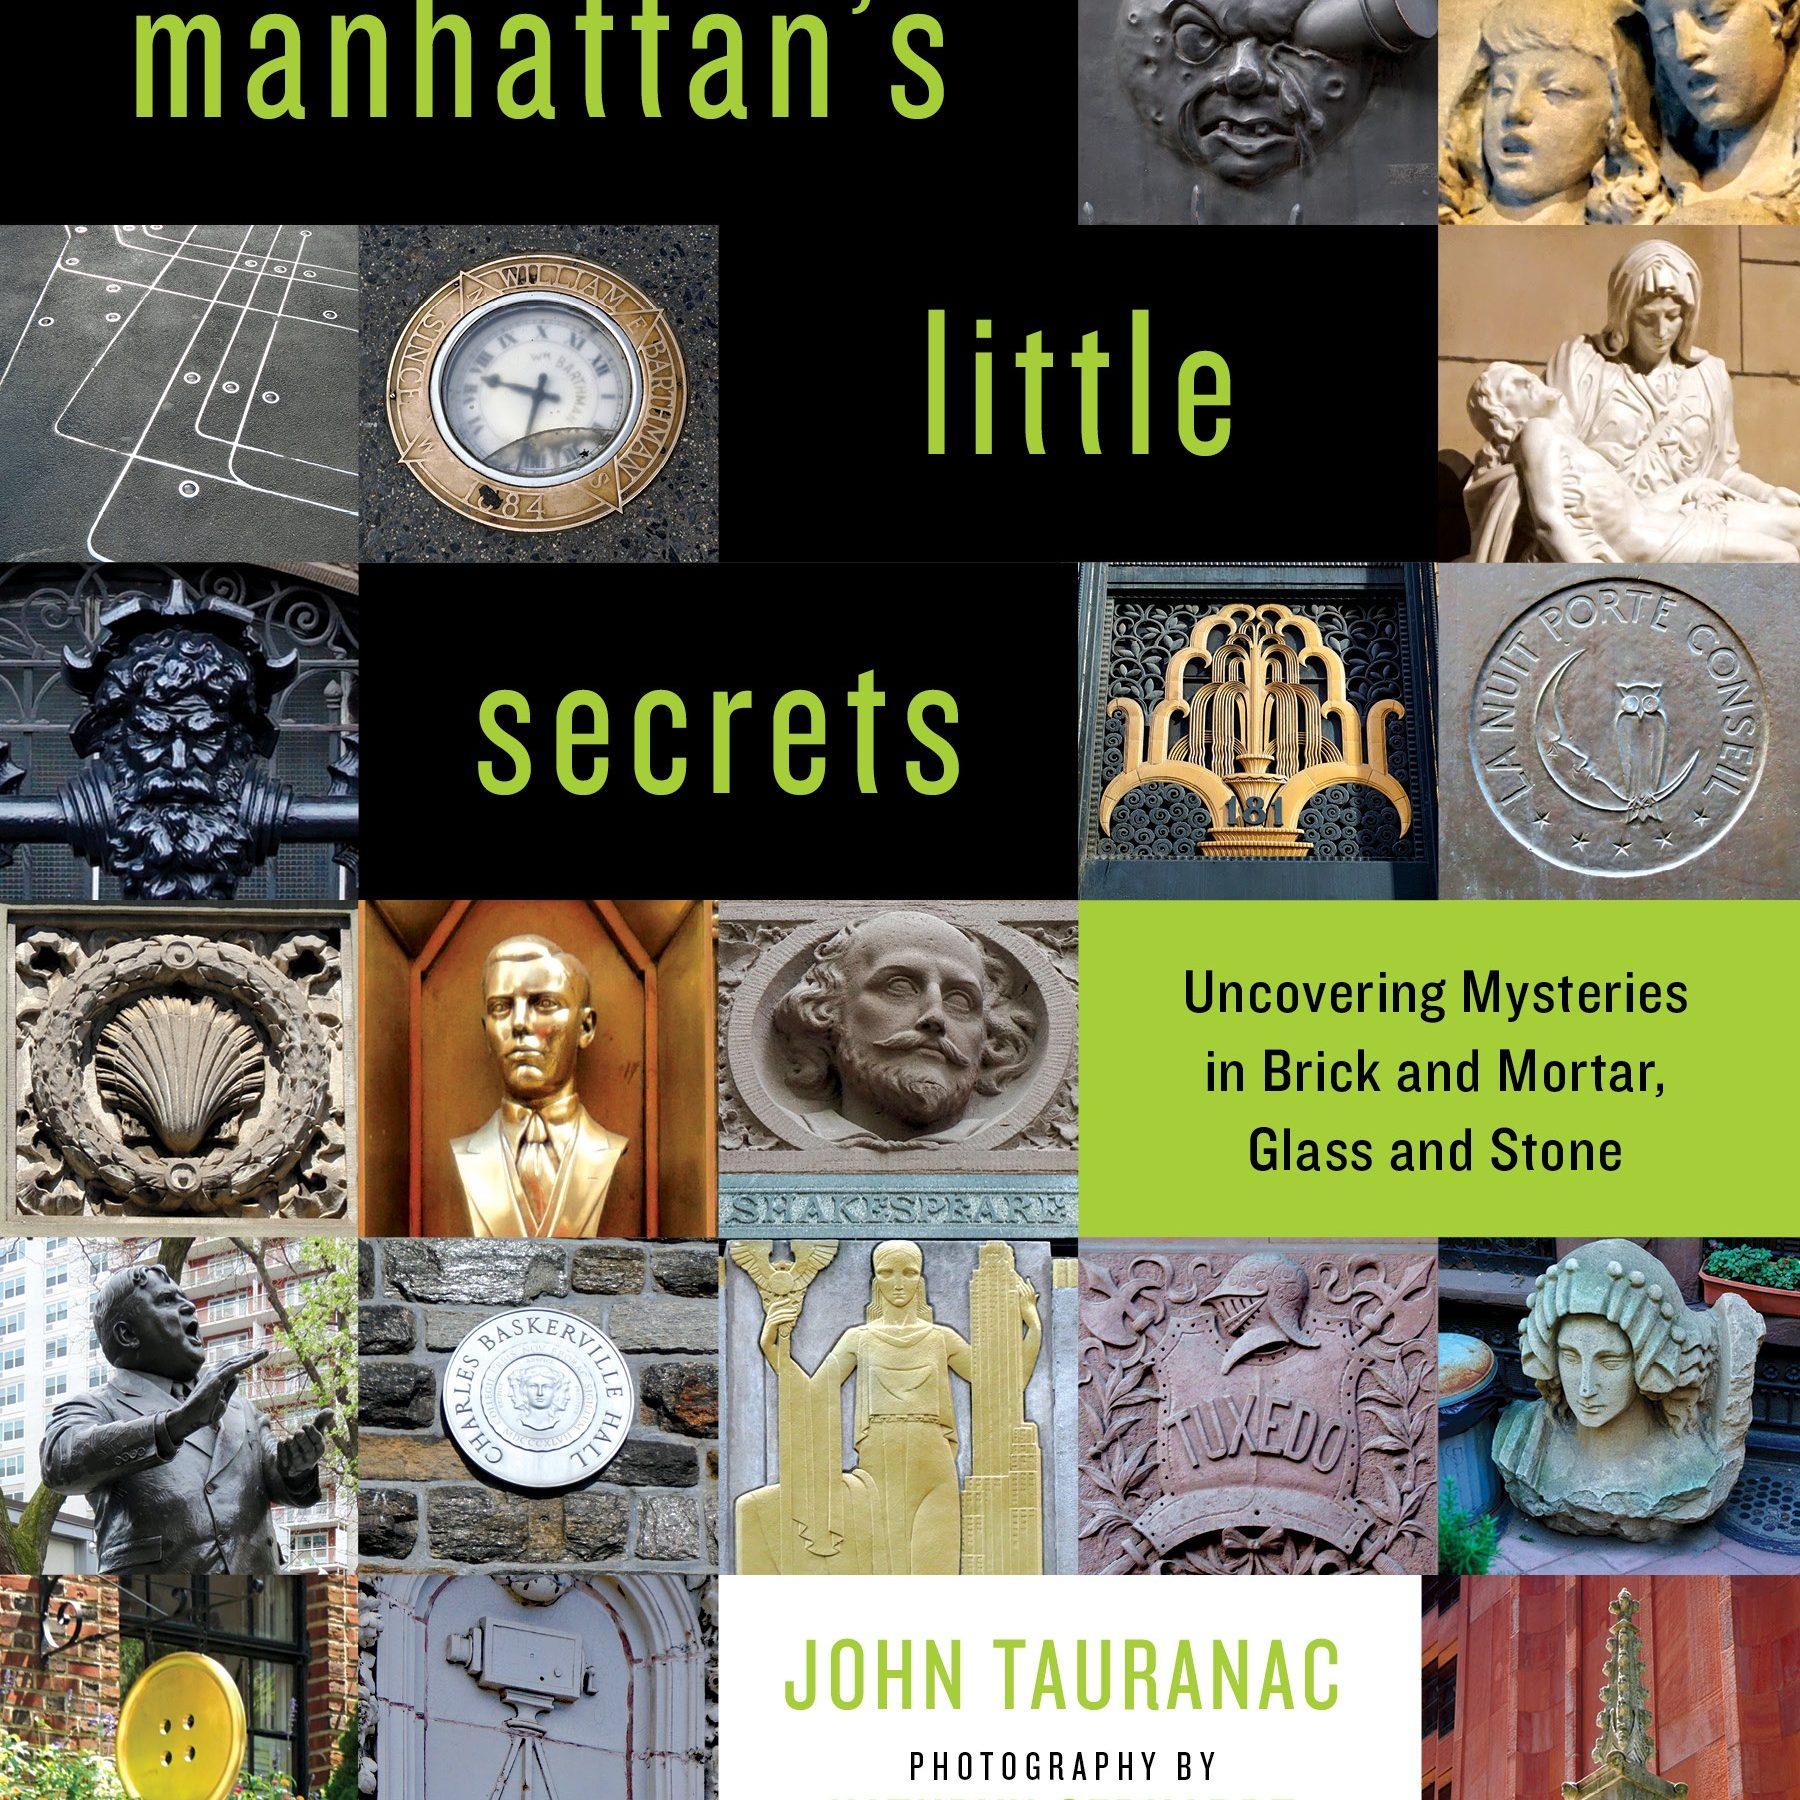 """Manhattan's Little Secrets"" Author's Talk with John Tauranac"